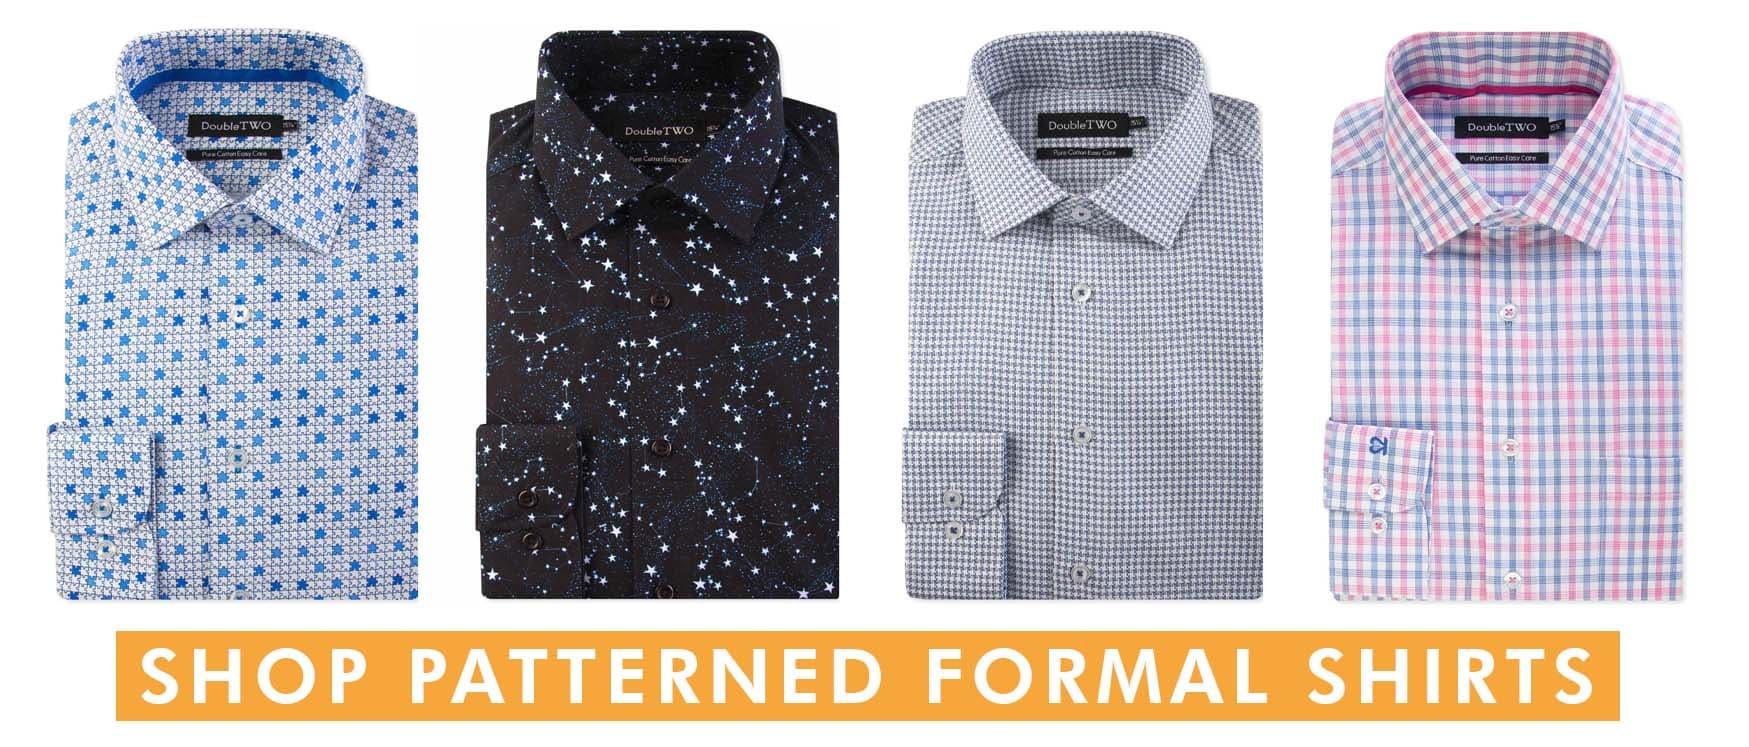 Patterned Formal Shirts